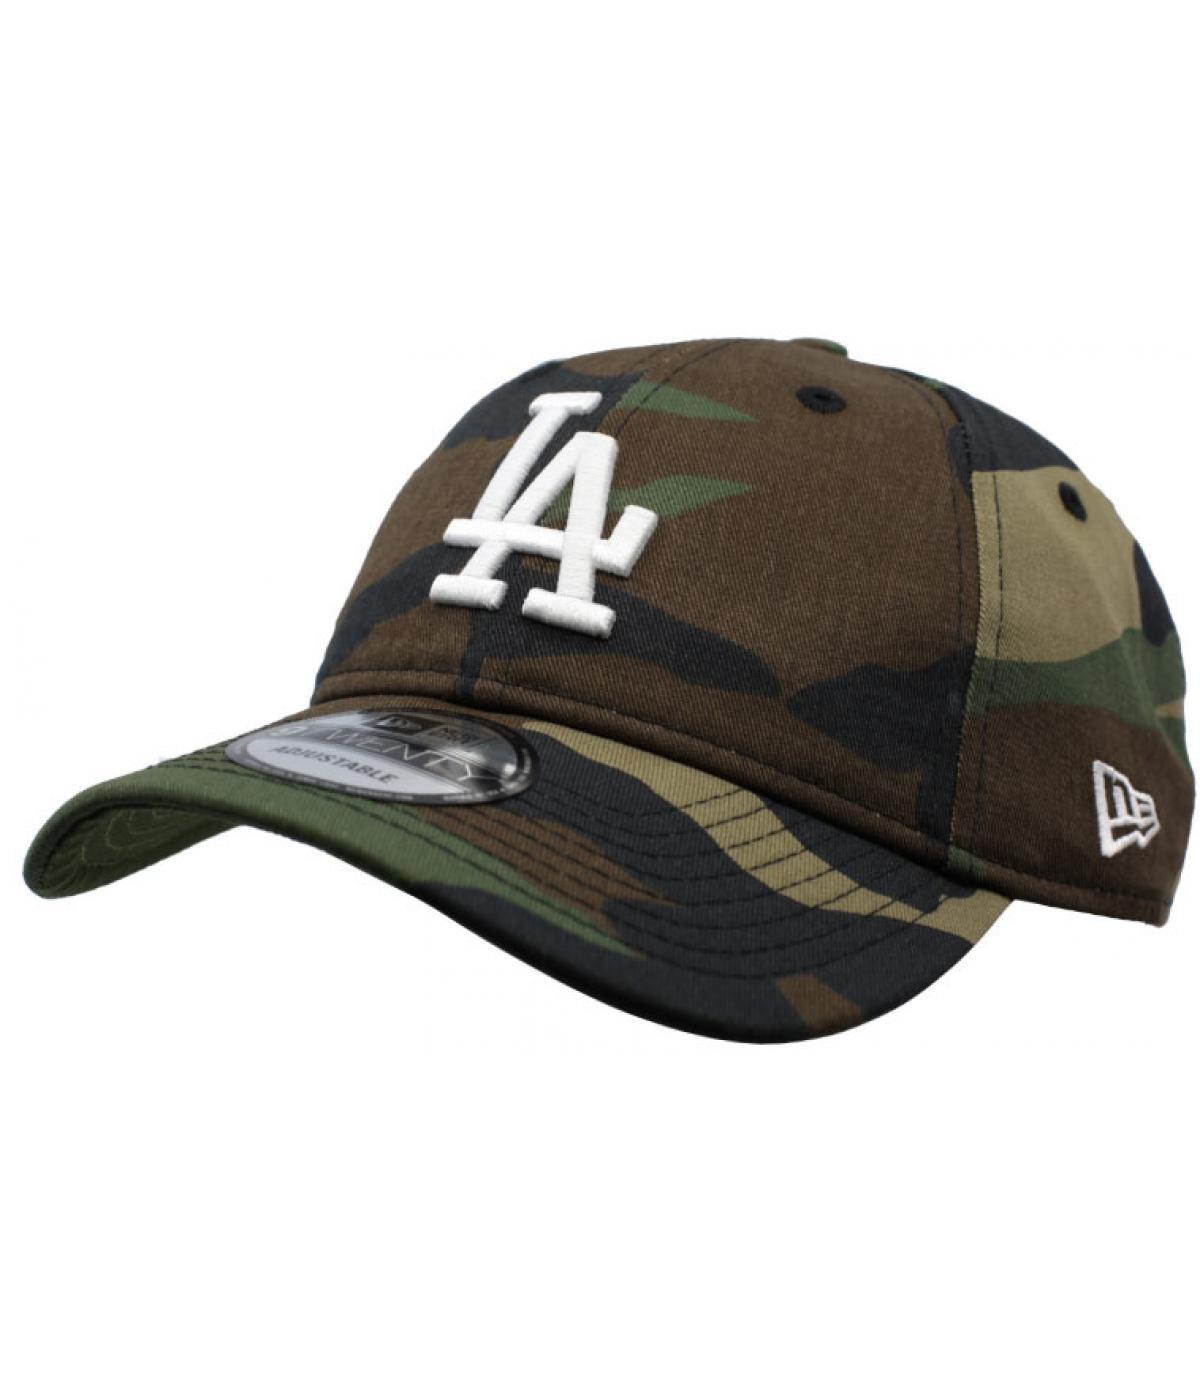 kap LA vouwbare camouflage